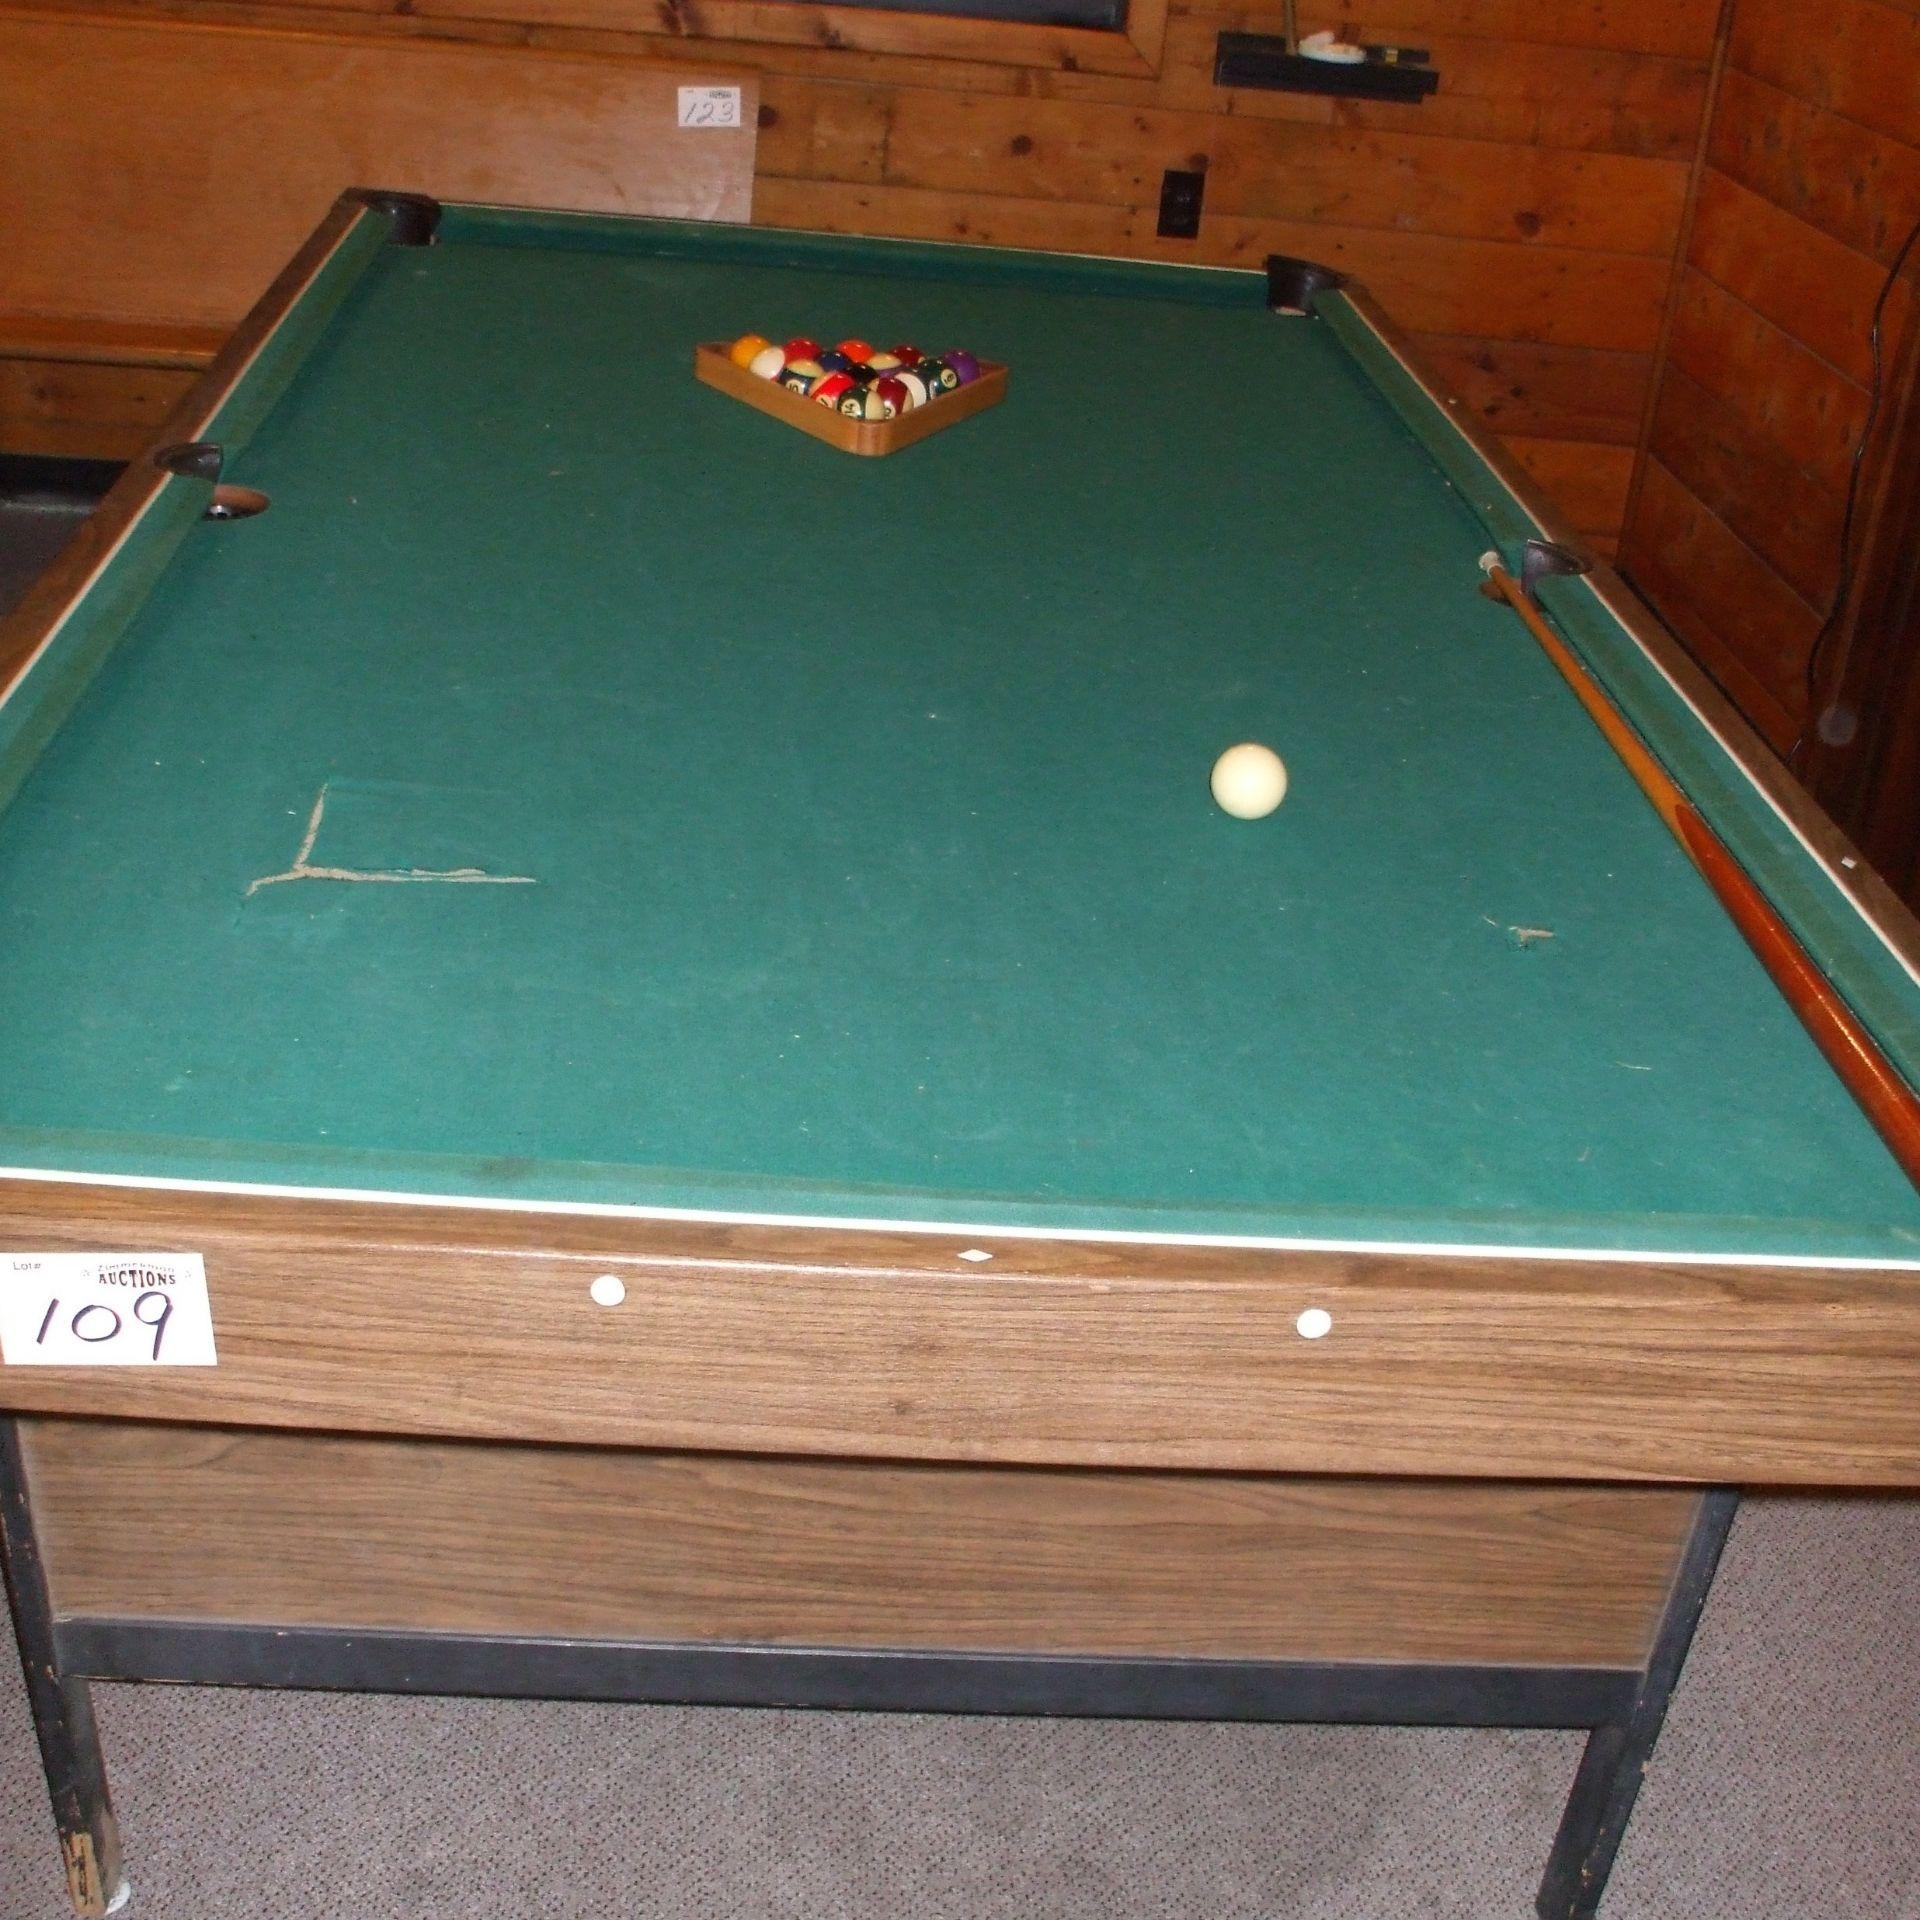 Pool table, balls & cues